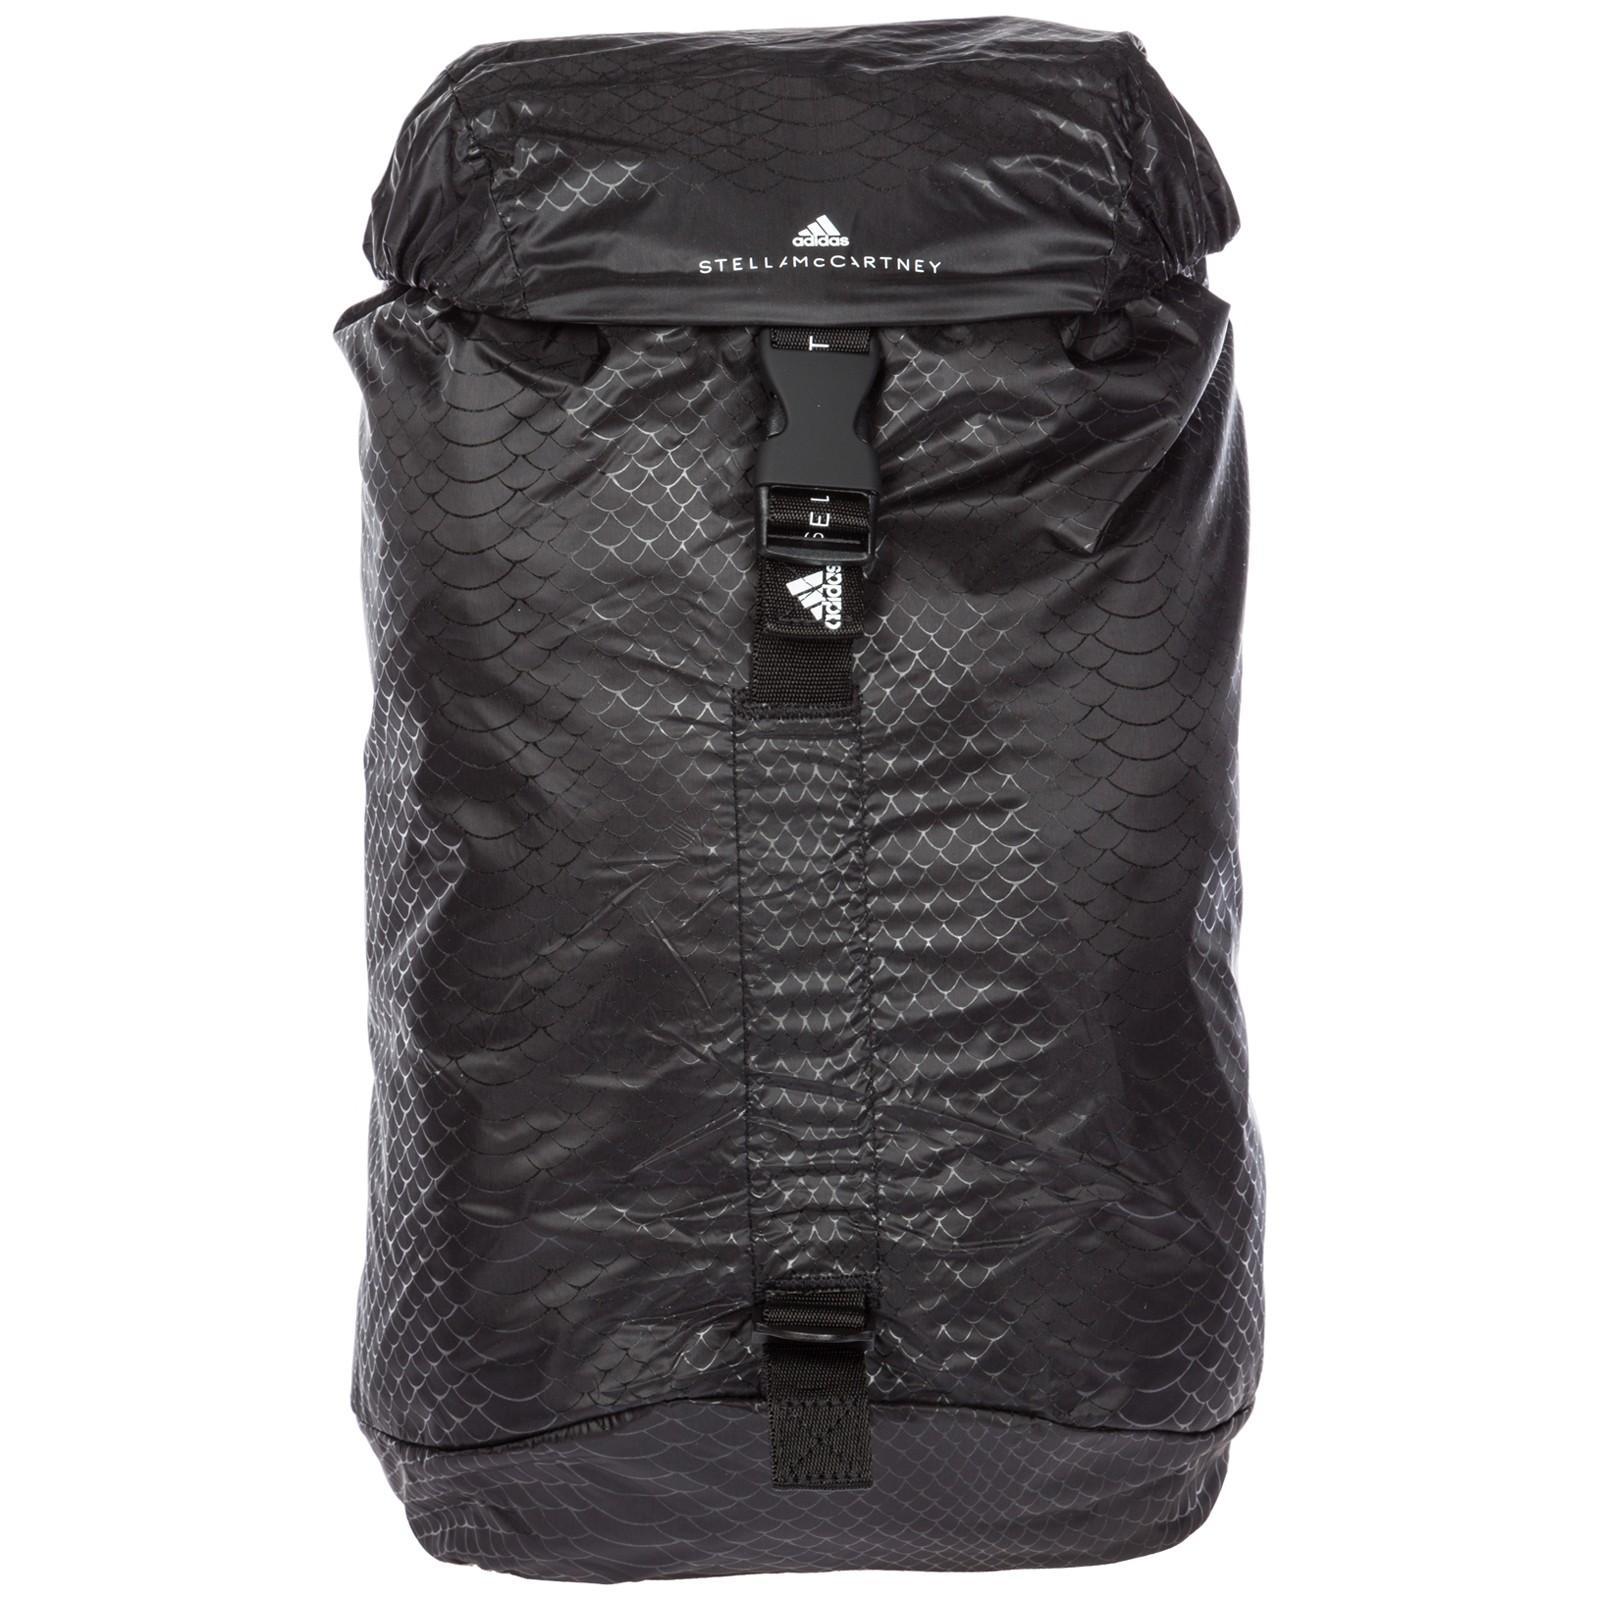 daf18b1397 Adidas By Stella Mccartney Women S Rucksack Backpack Travel Adizero In Black